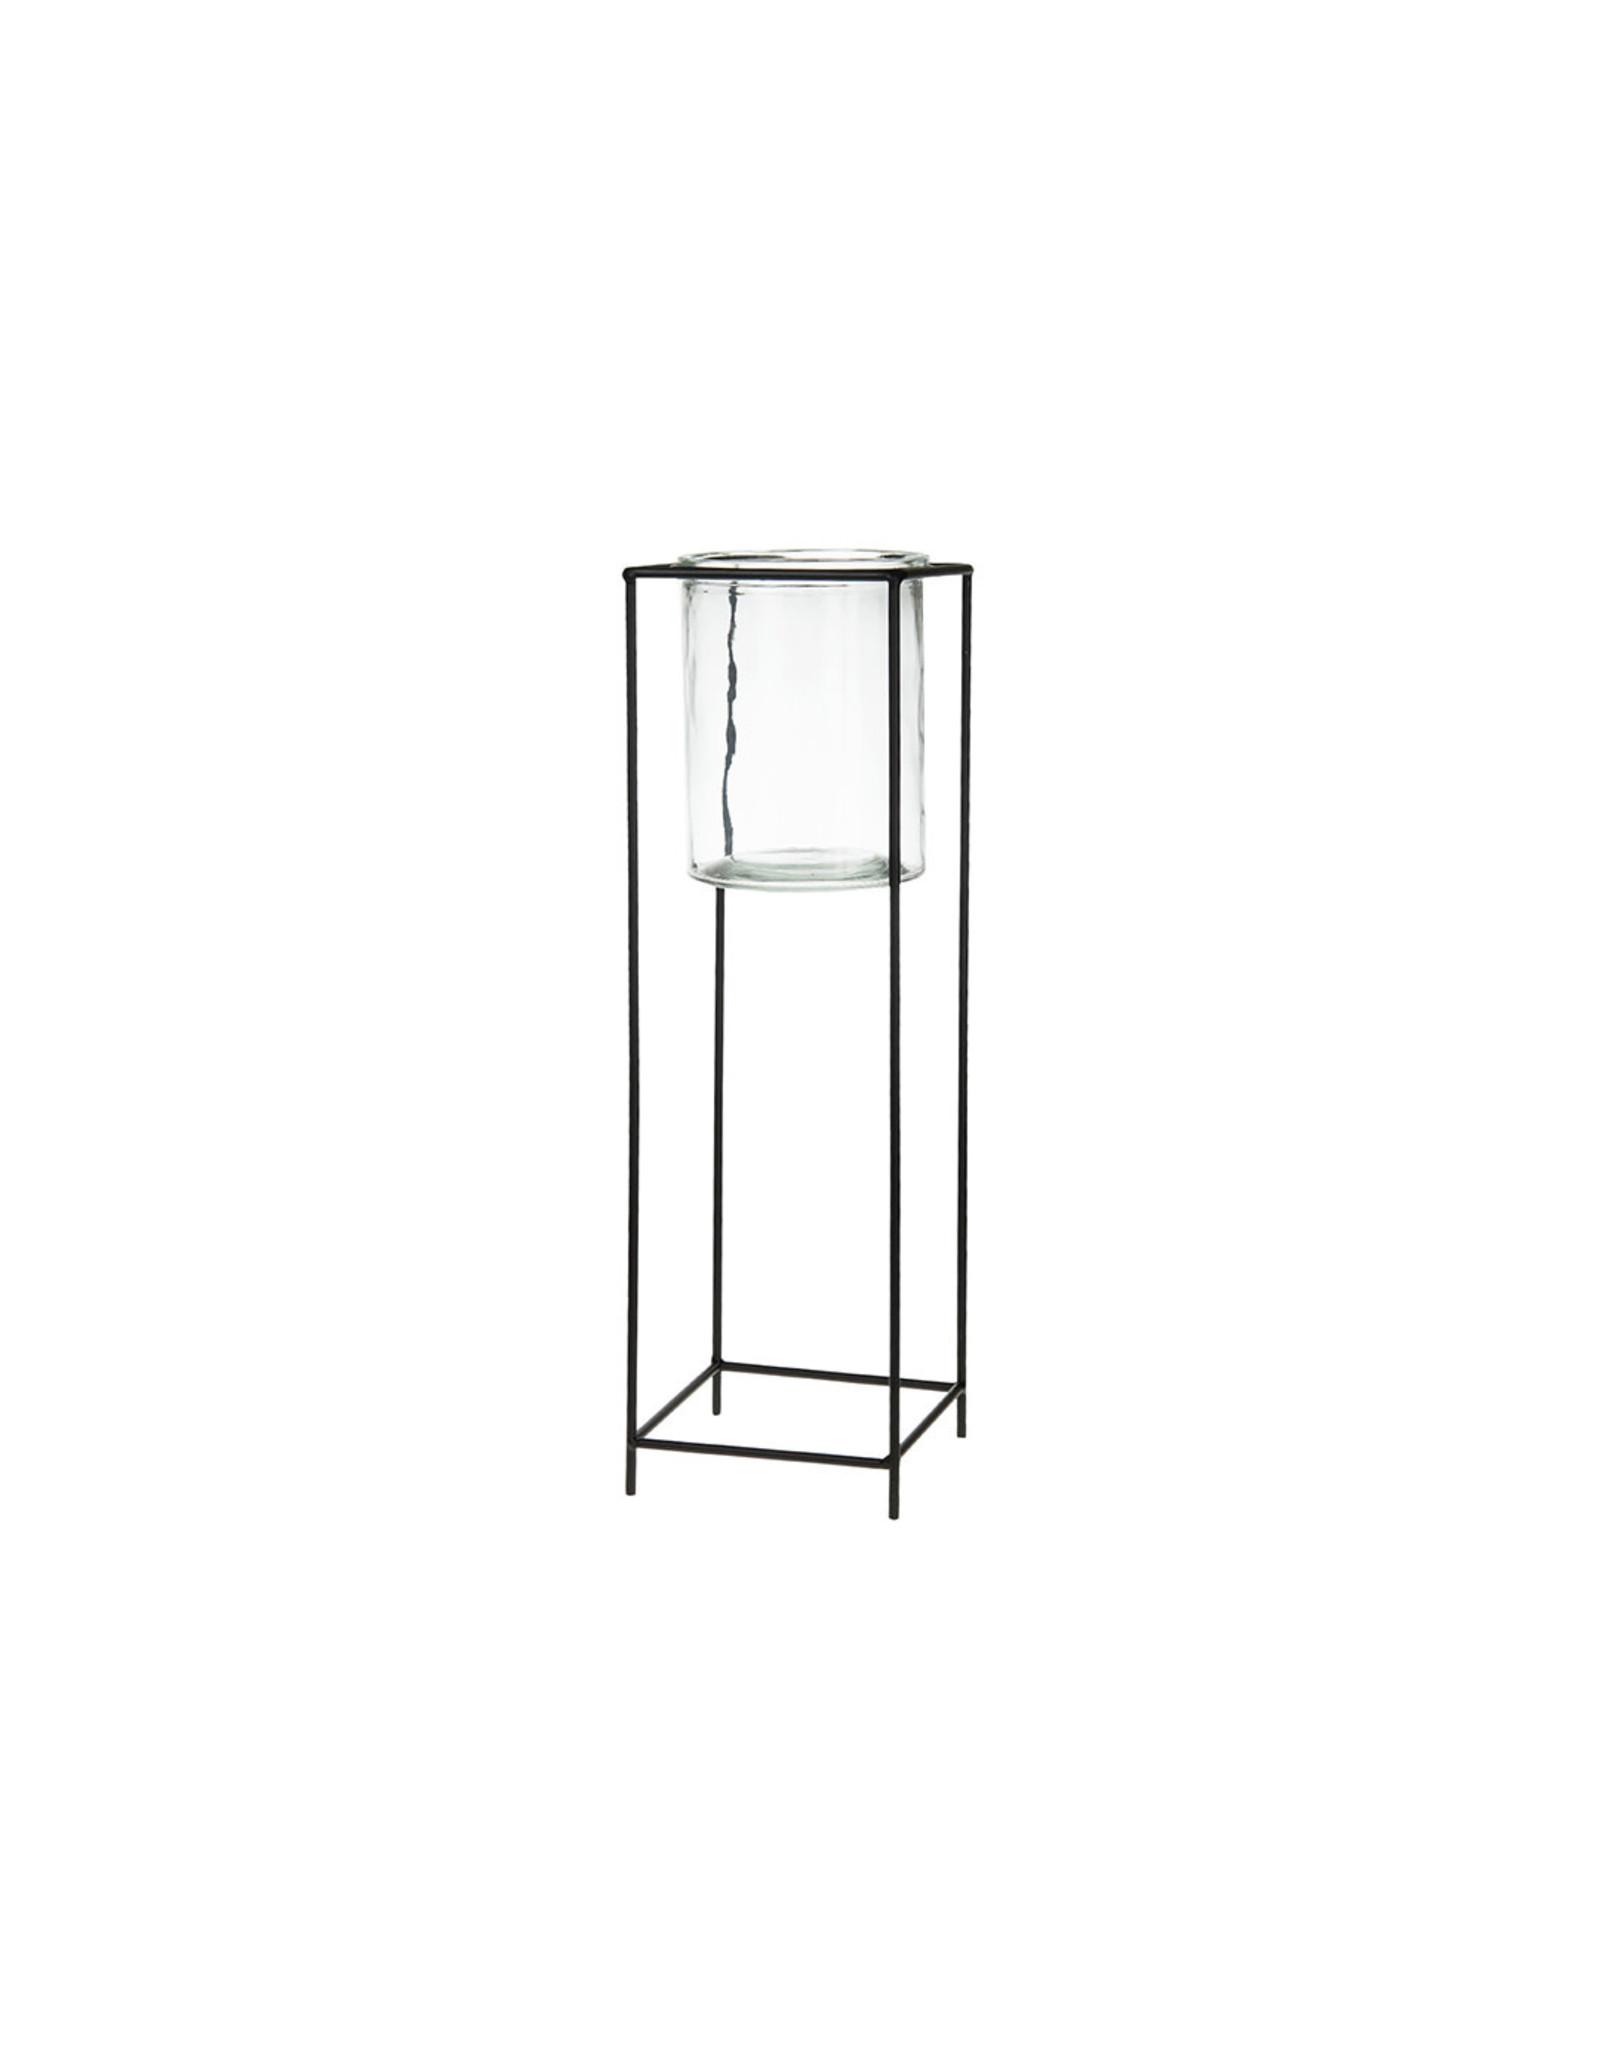 Dijk Candle holder glass/metal black 16x16x51cm